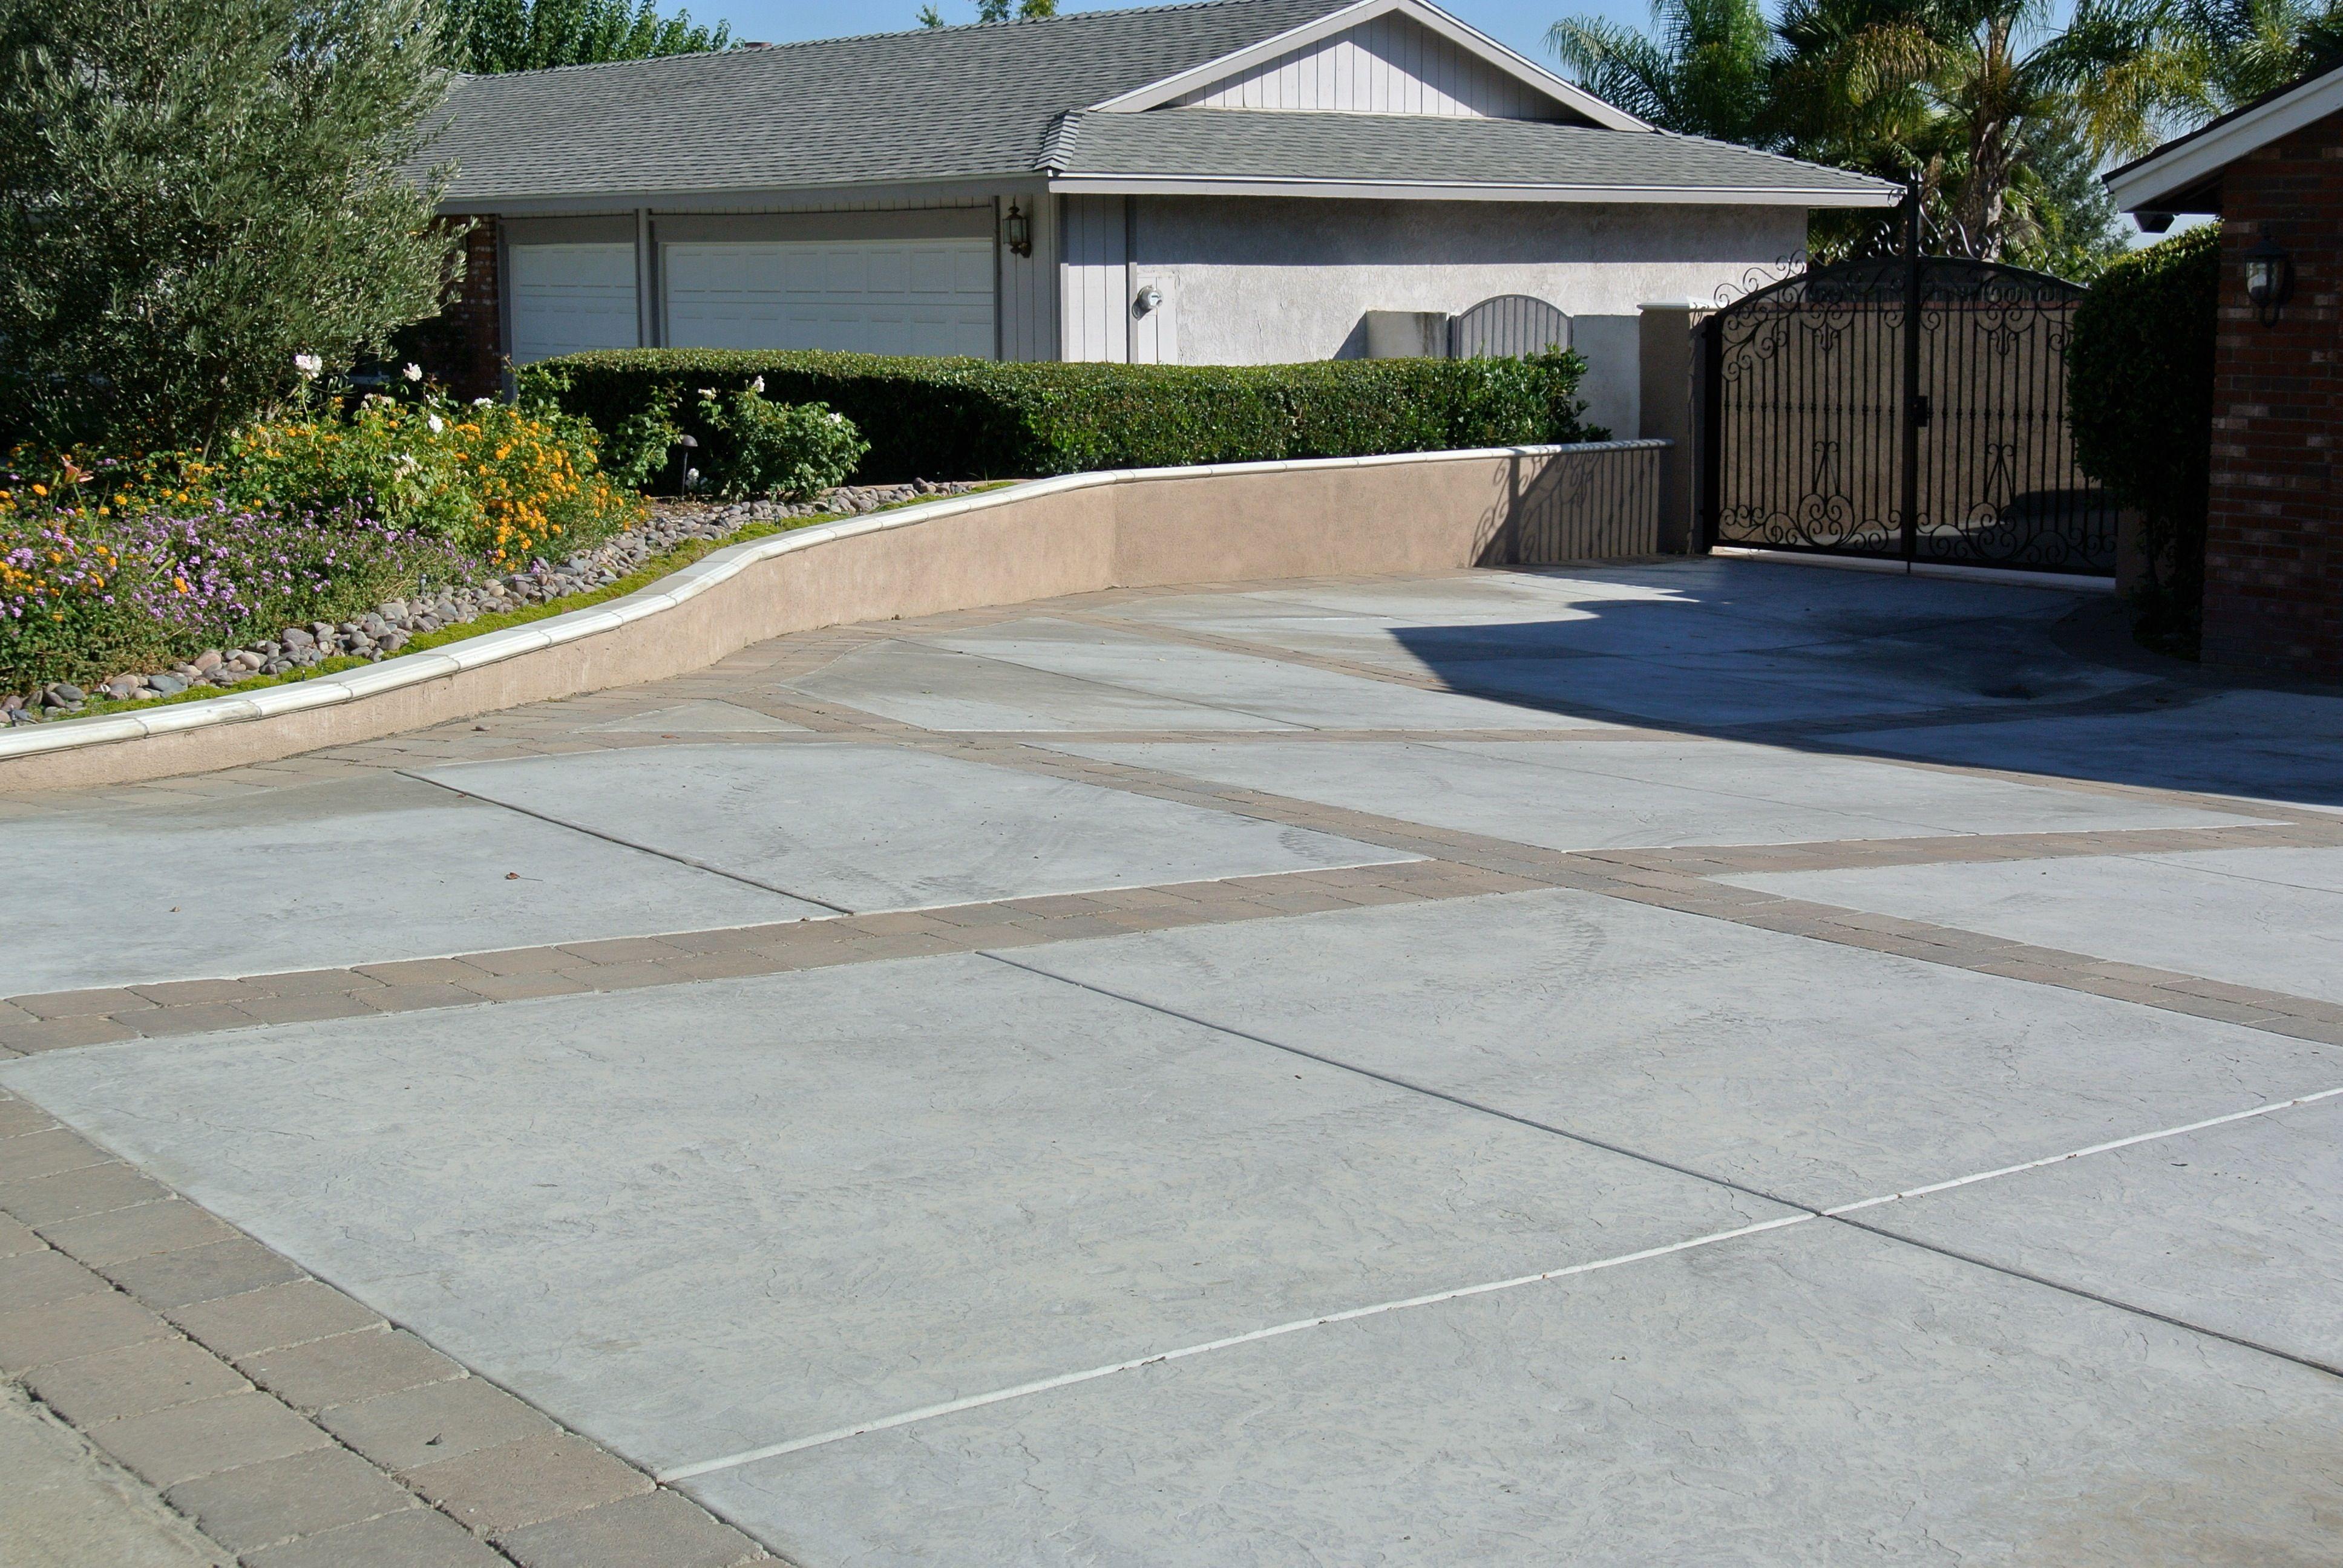 stone driveway yahoo image search results - Concrete Driveway Design Ideas